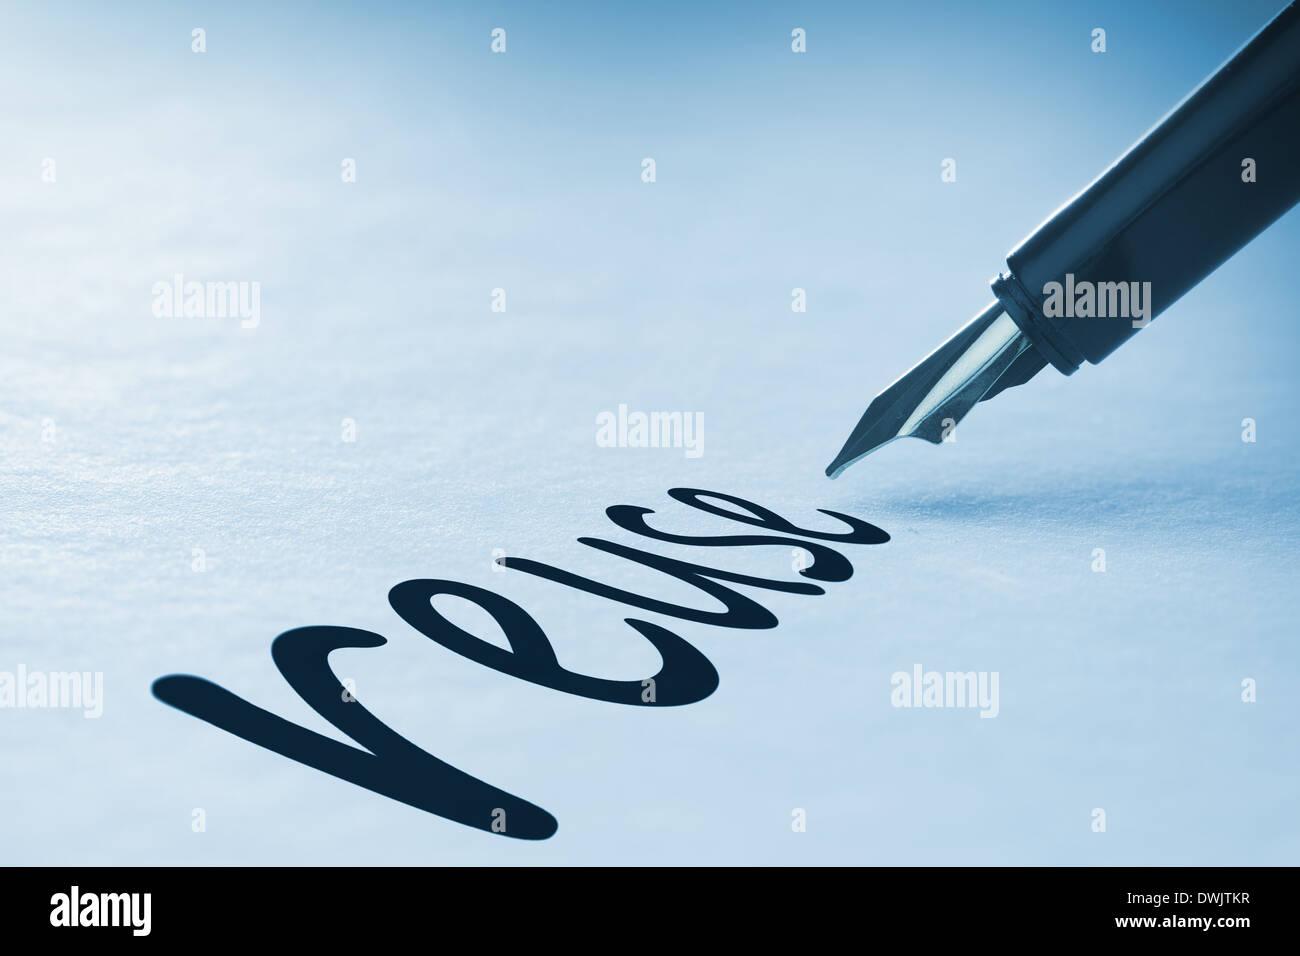 Fountain pen writing Reuse - Stock Image